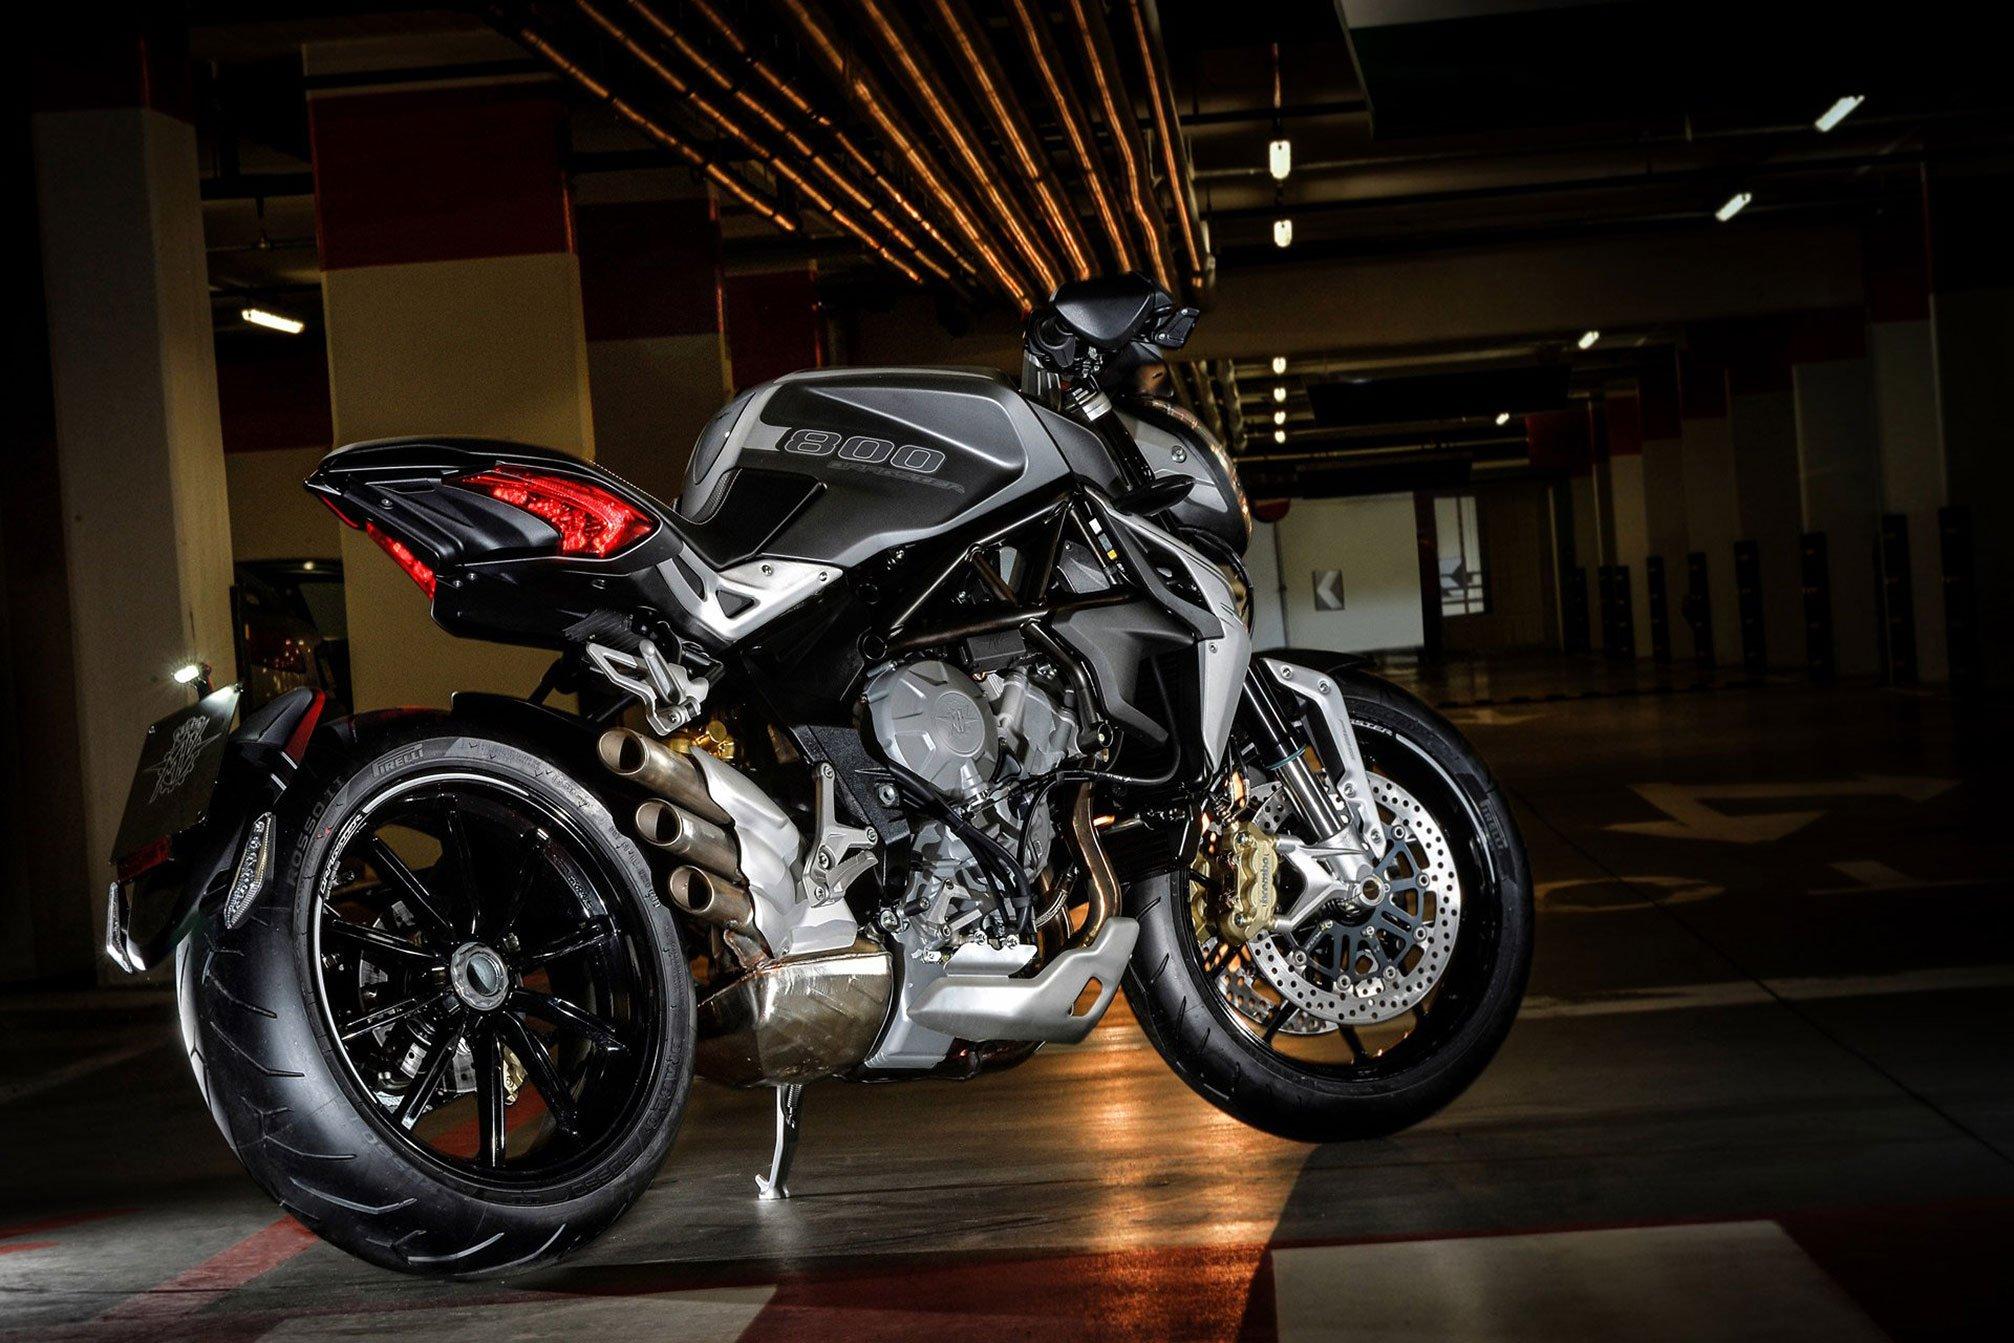 2014 mv-agusta brutale 800 dragster superbike bike motorbike g